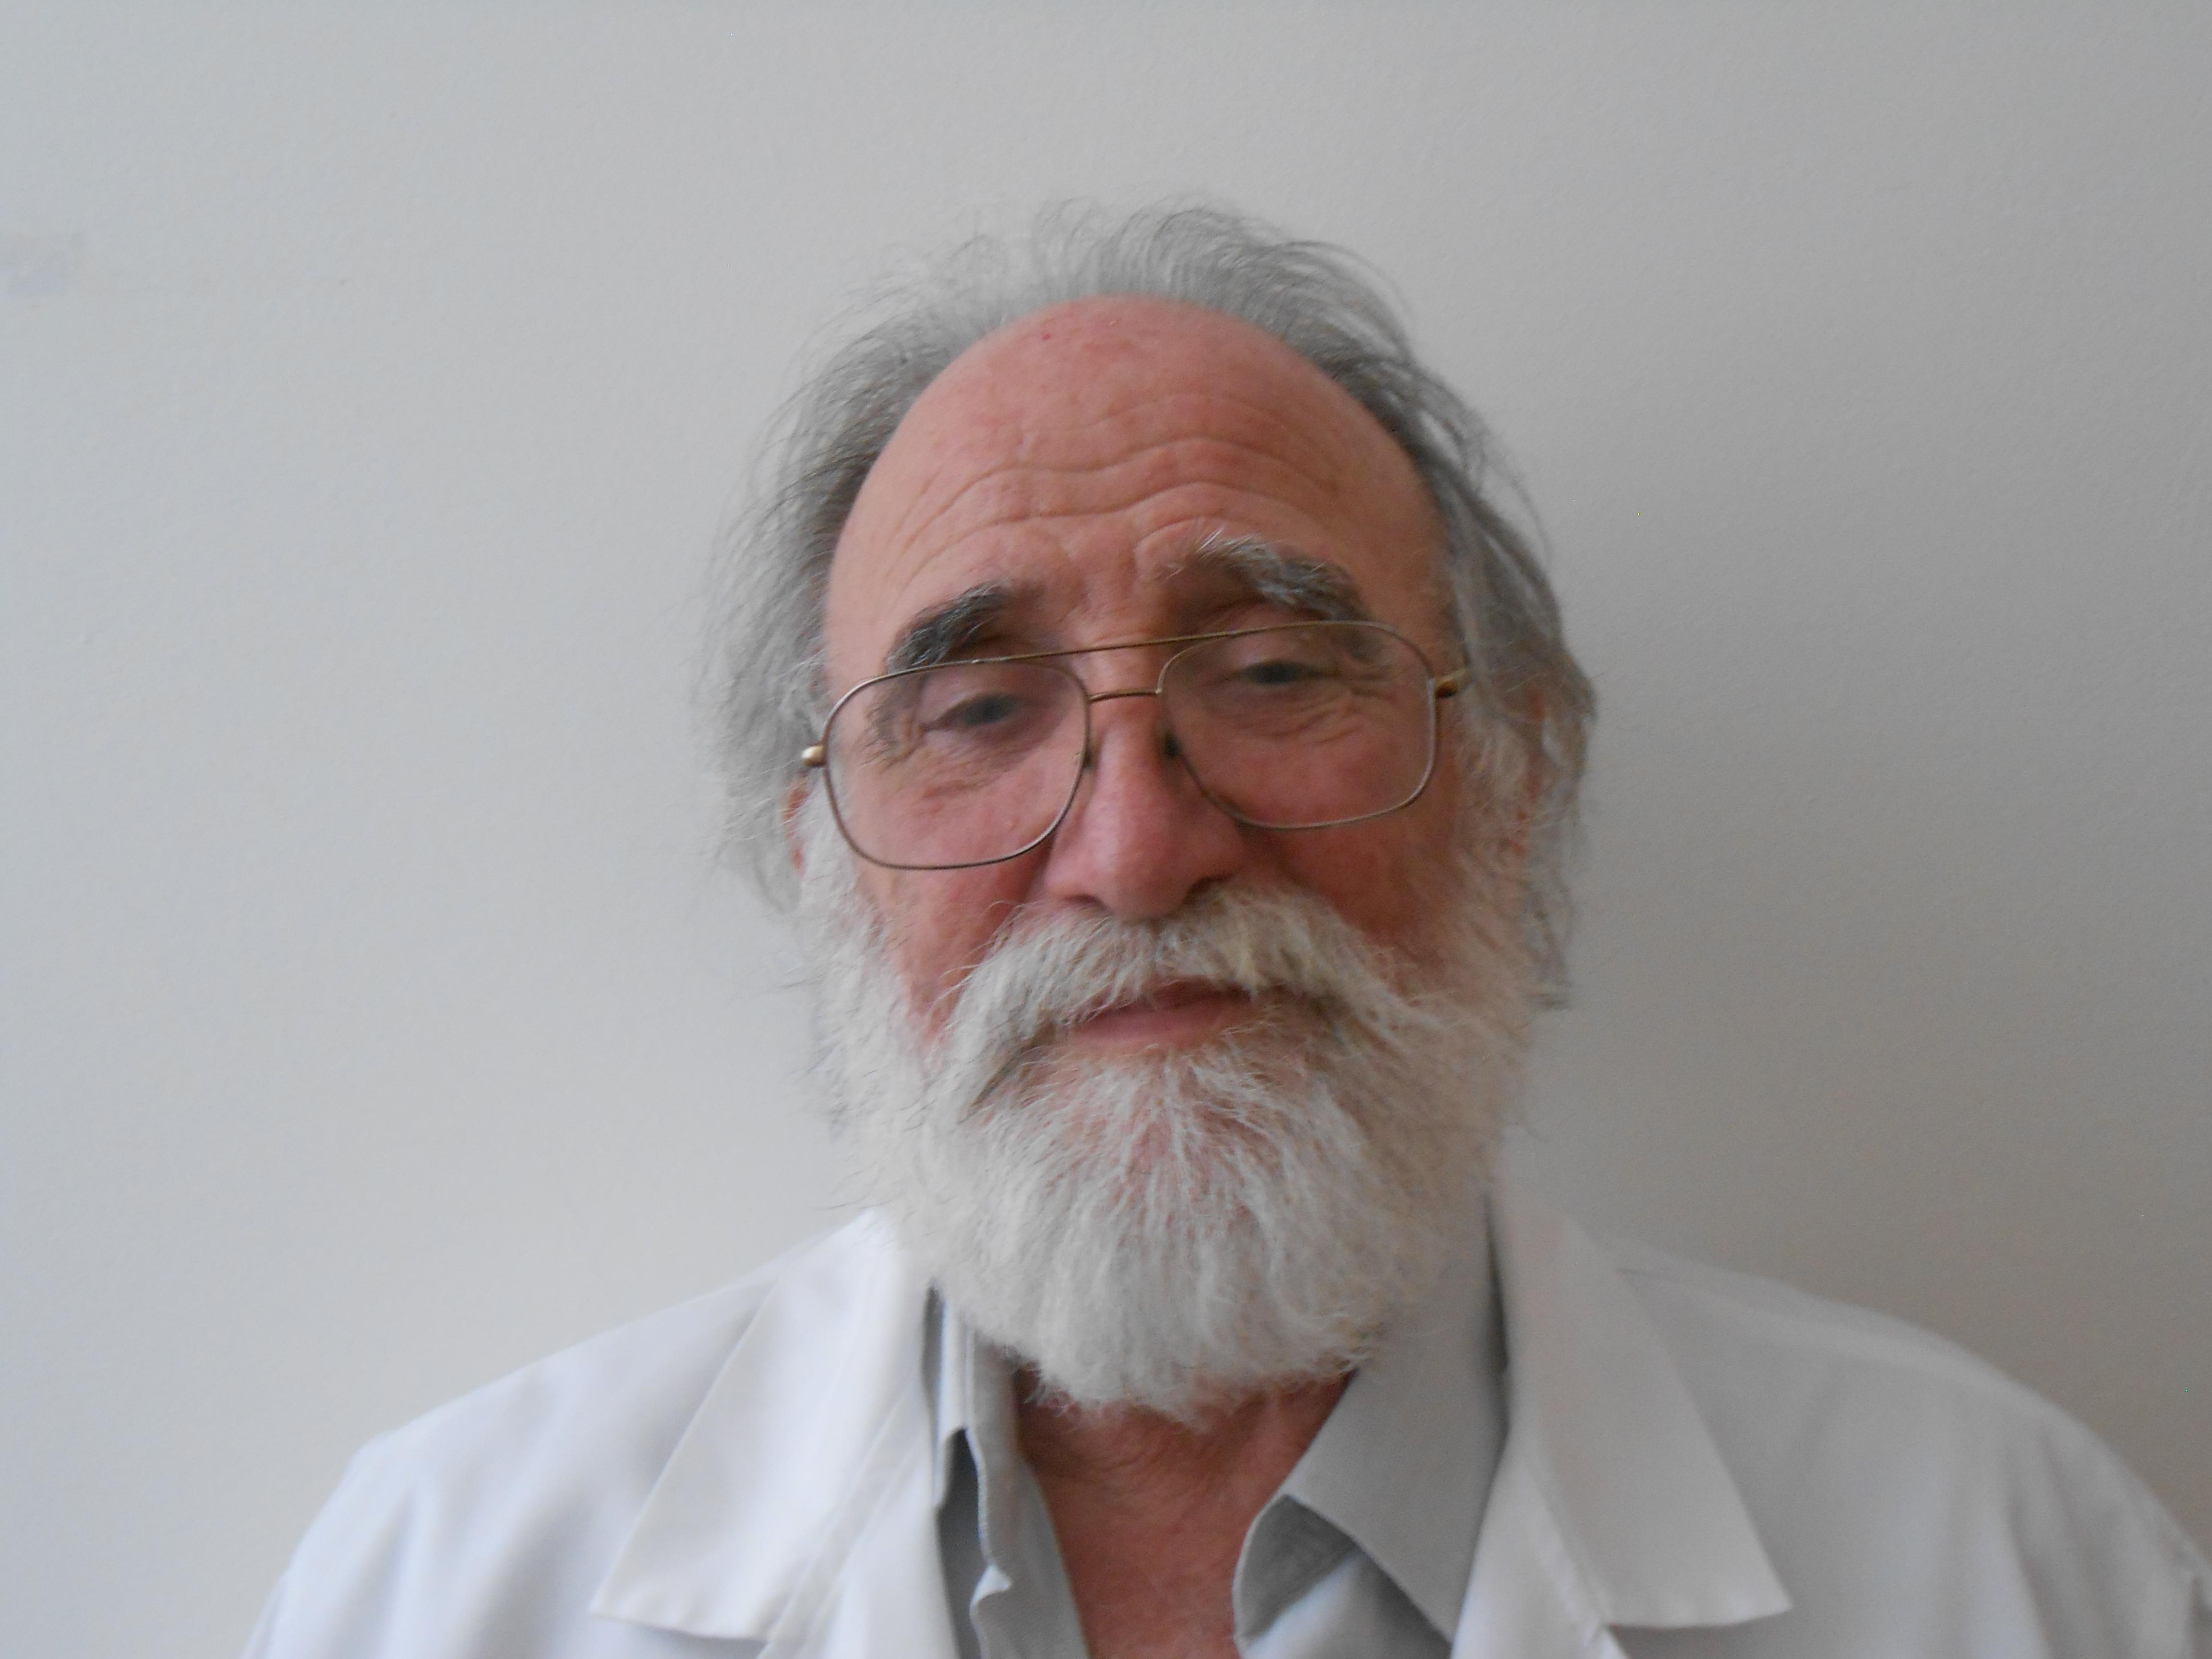 Dr. Vaz Teixeira